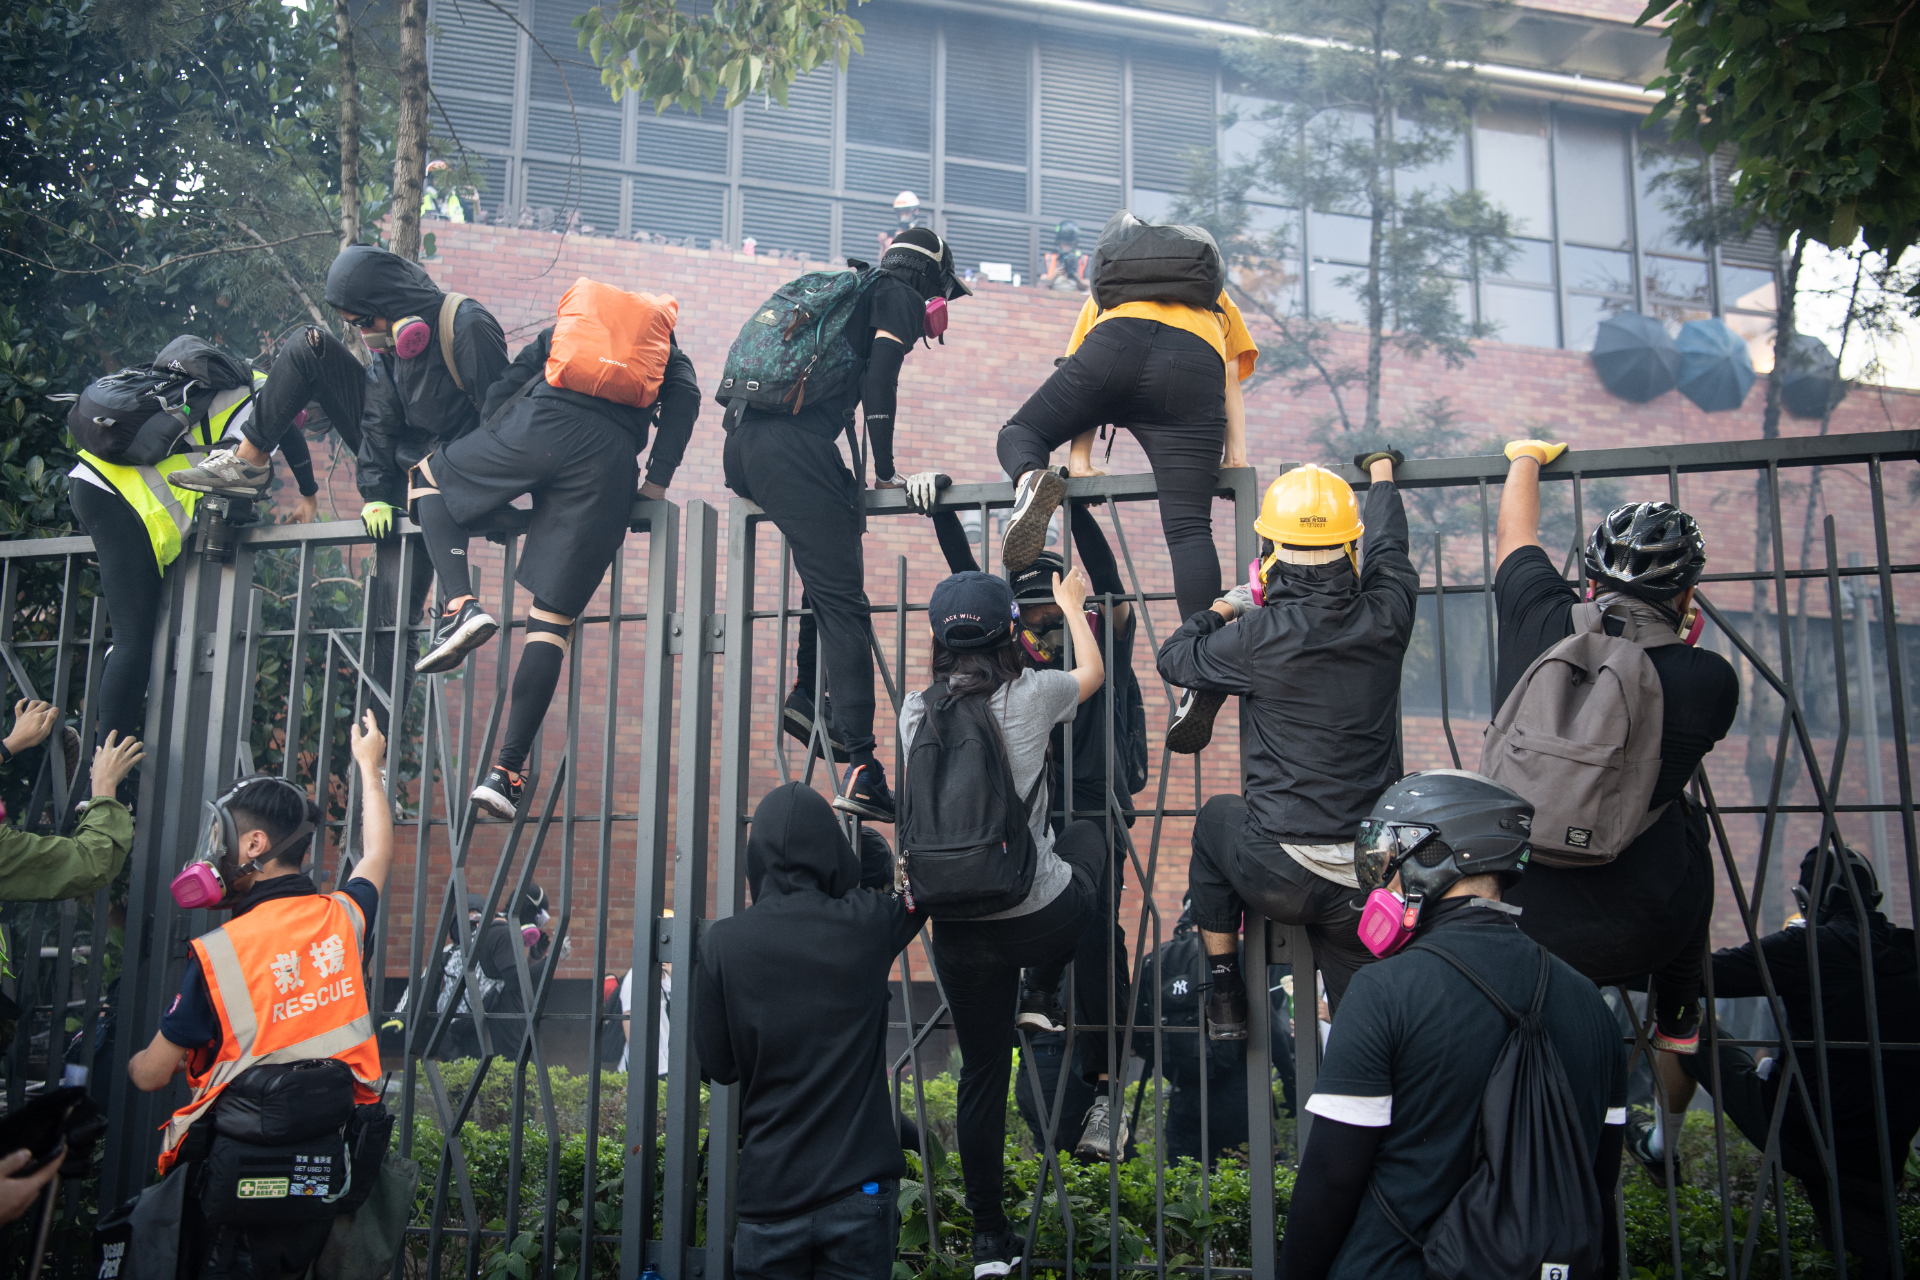 Protesters climb over fences